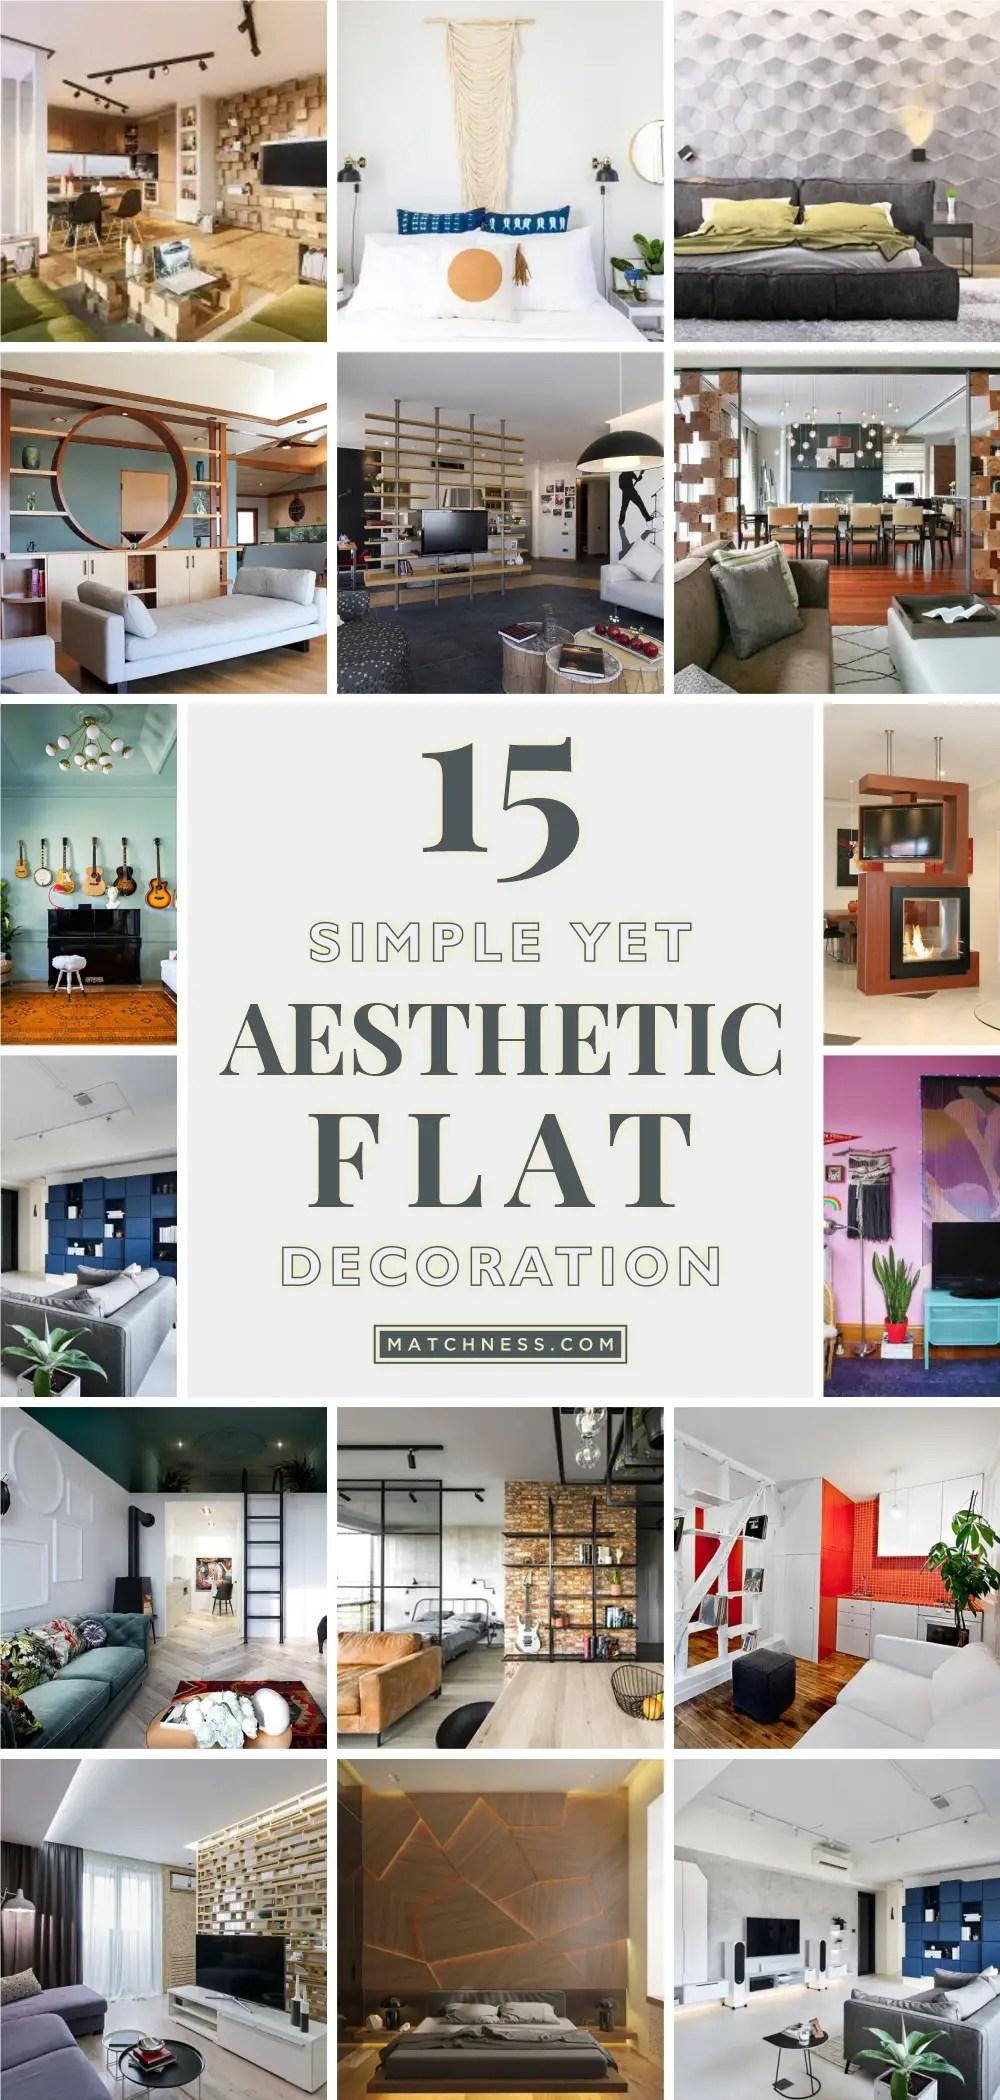 15-simple-yet-aesthetic-flat-decoration-1